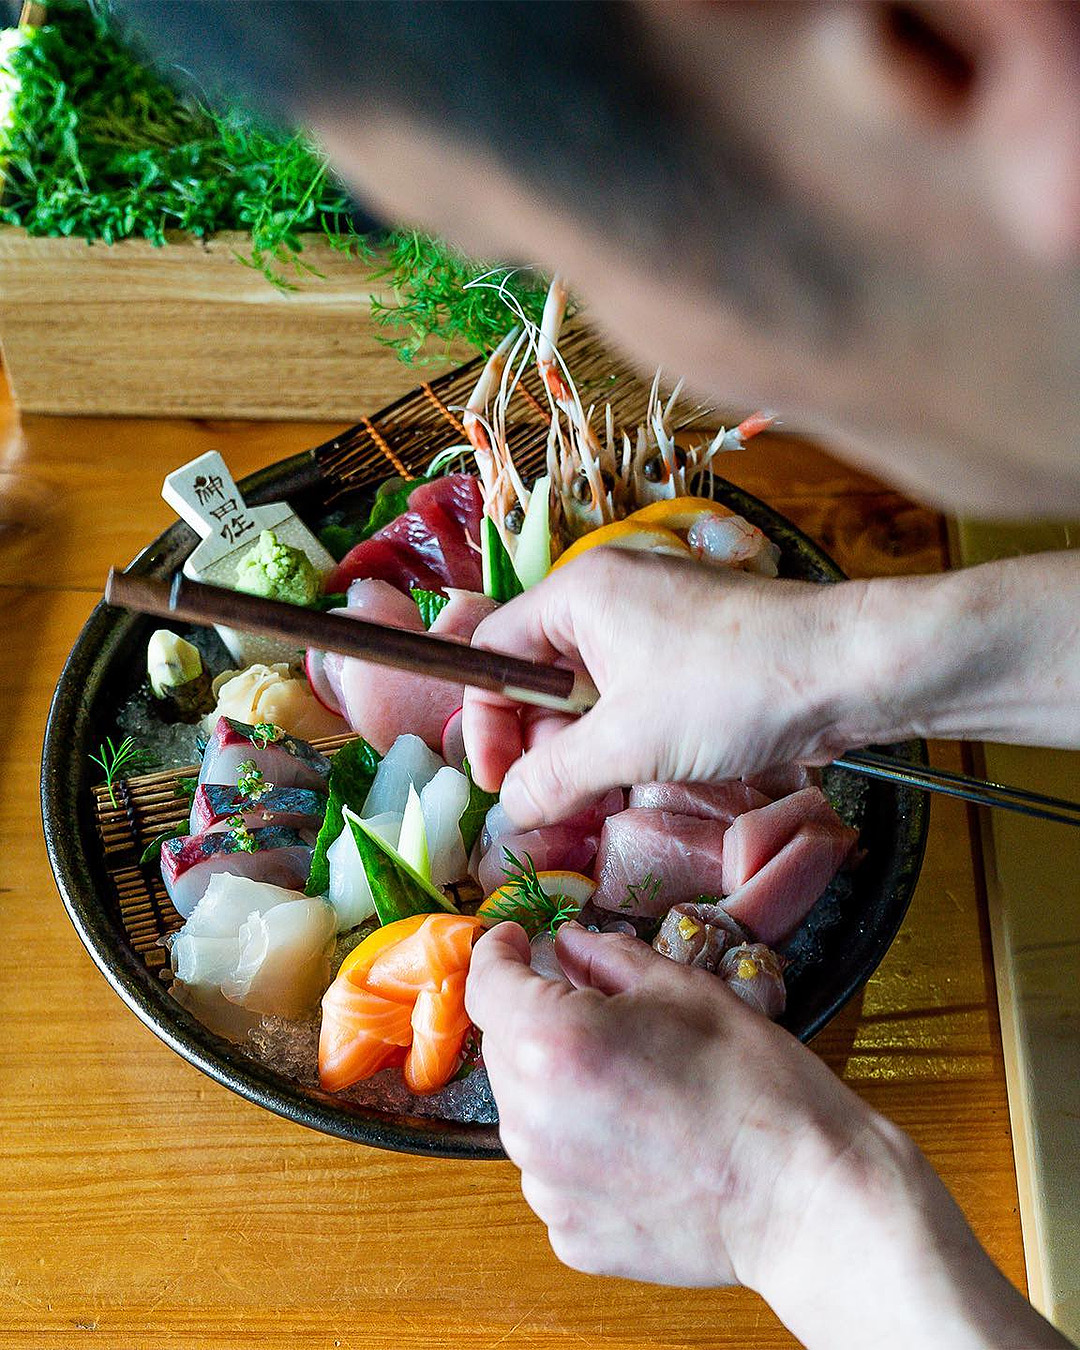 Makoto puts the finishing touches on a huge sashimi platter at Cocoro.